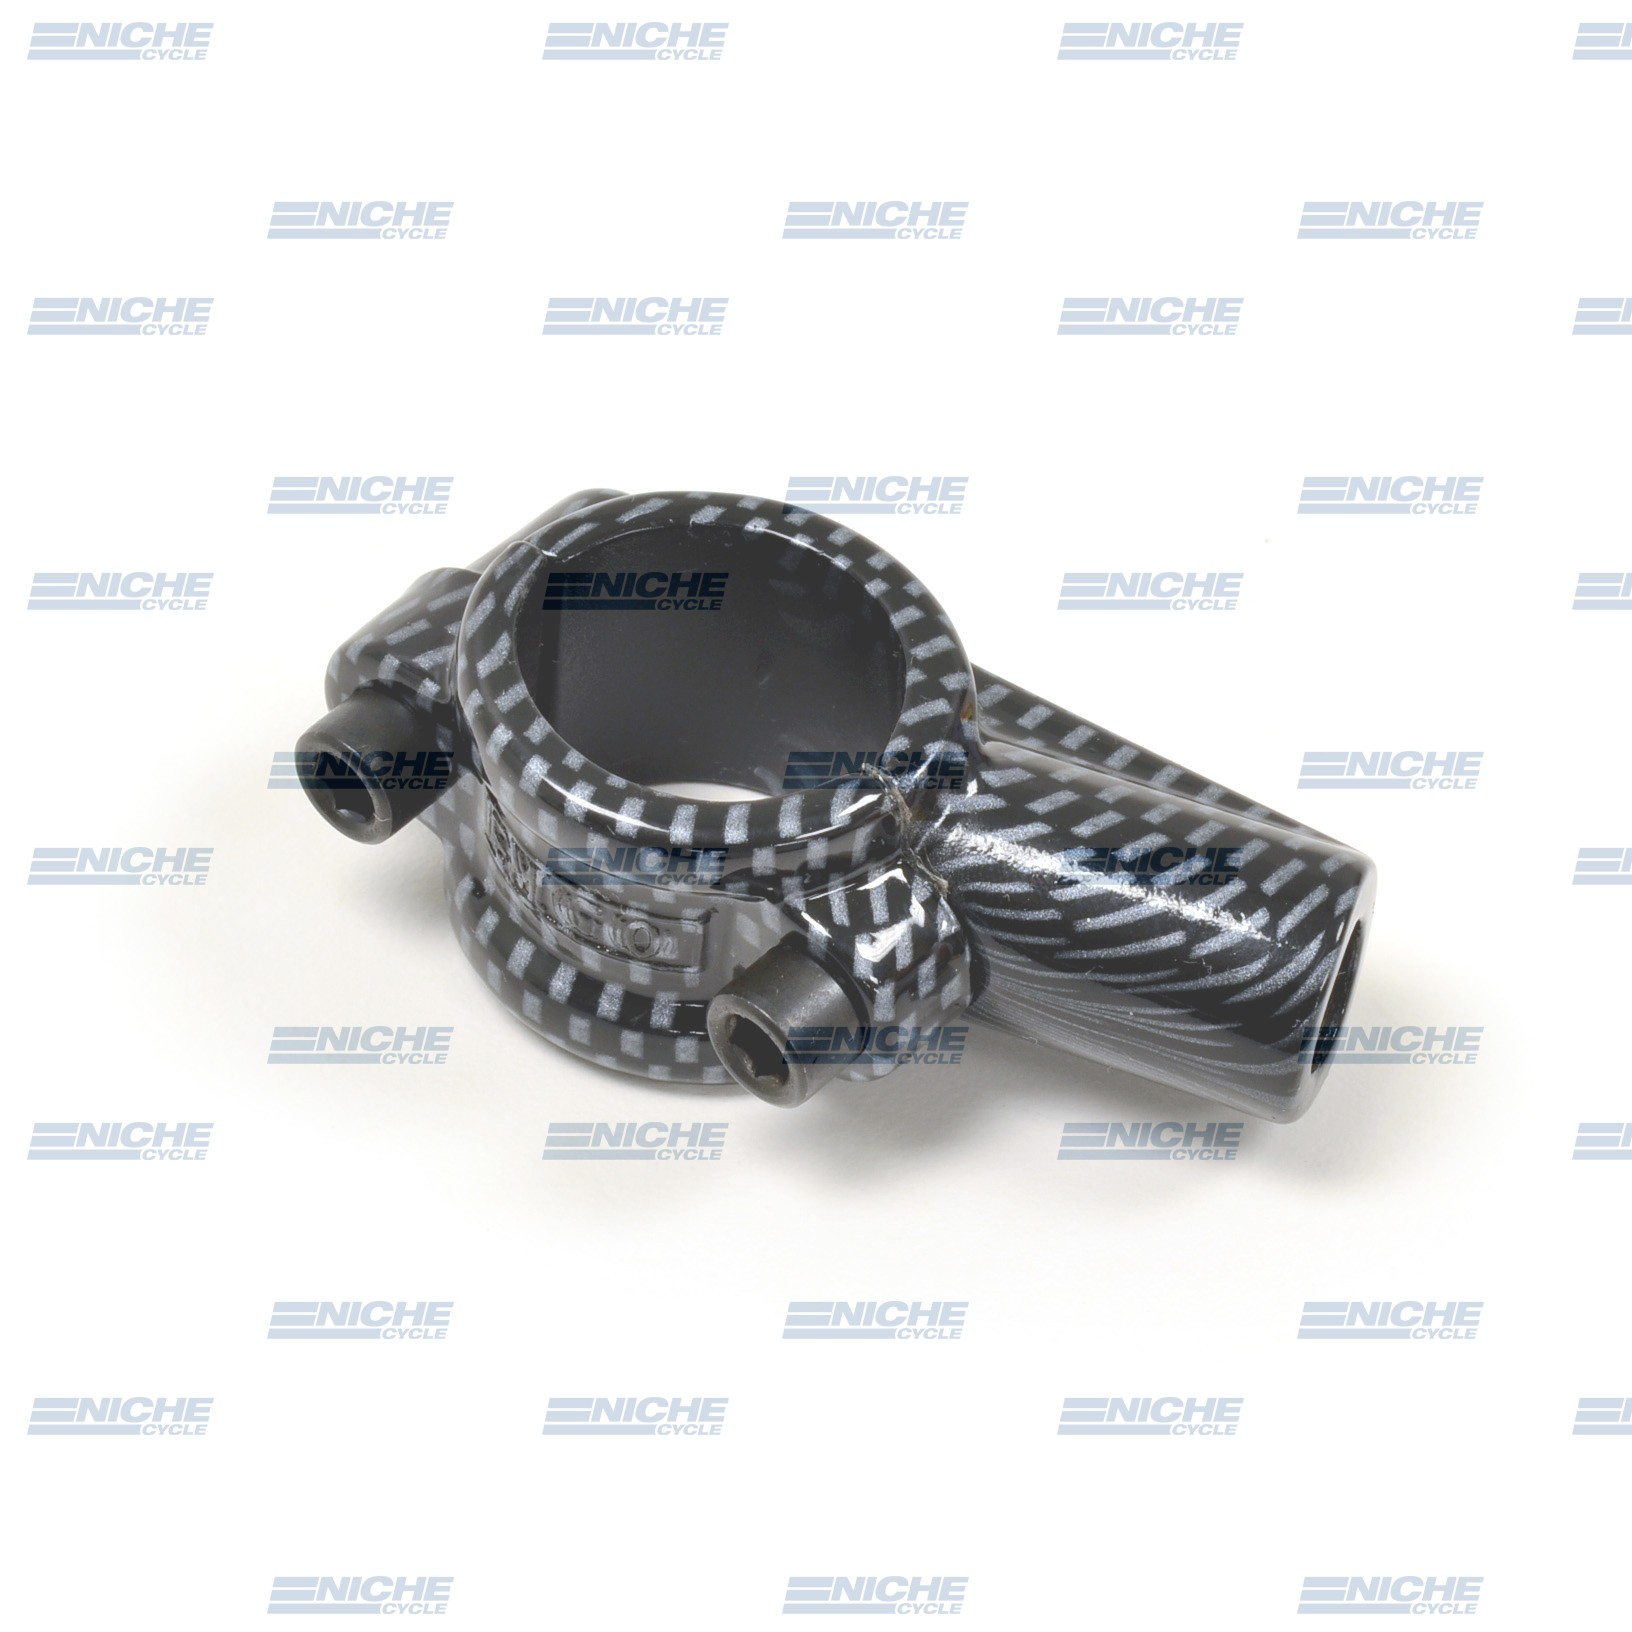 Clamp On Handlebar Mirror Bracket - 10mm Yamaha Right 20-28127